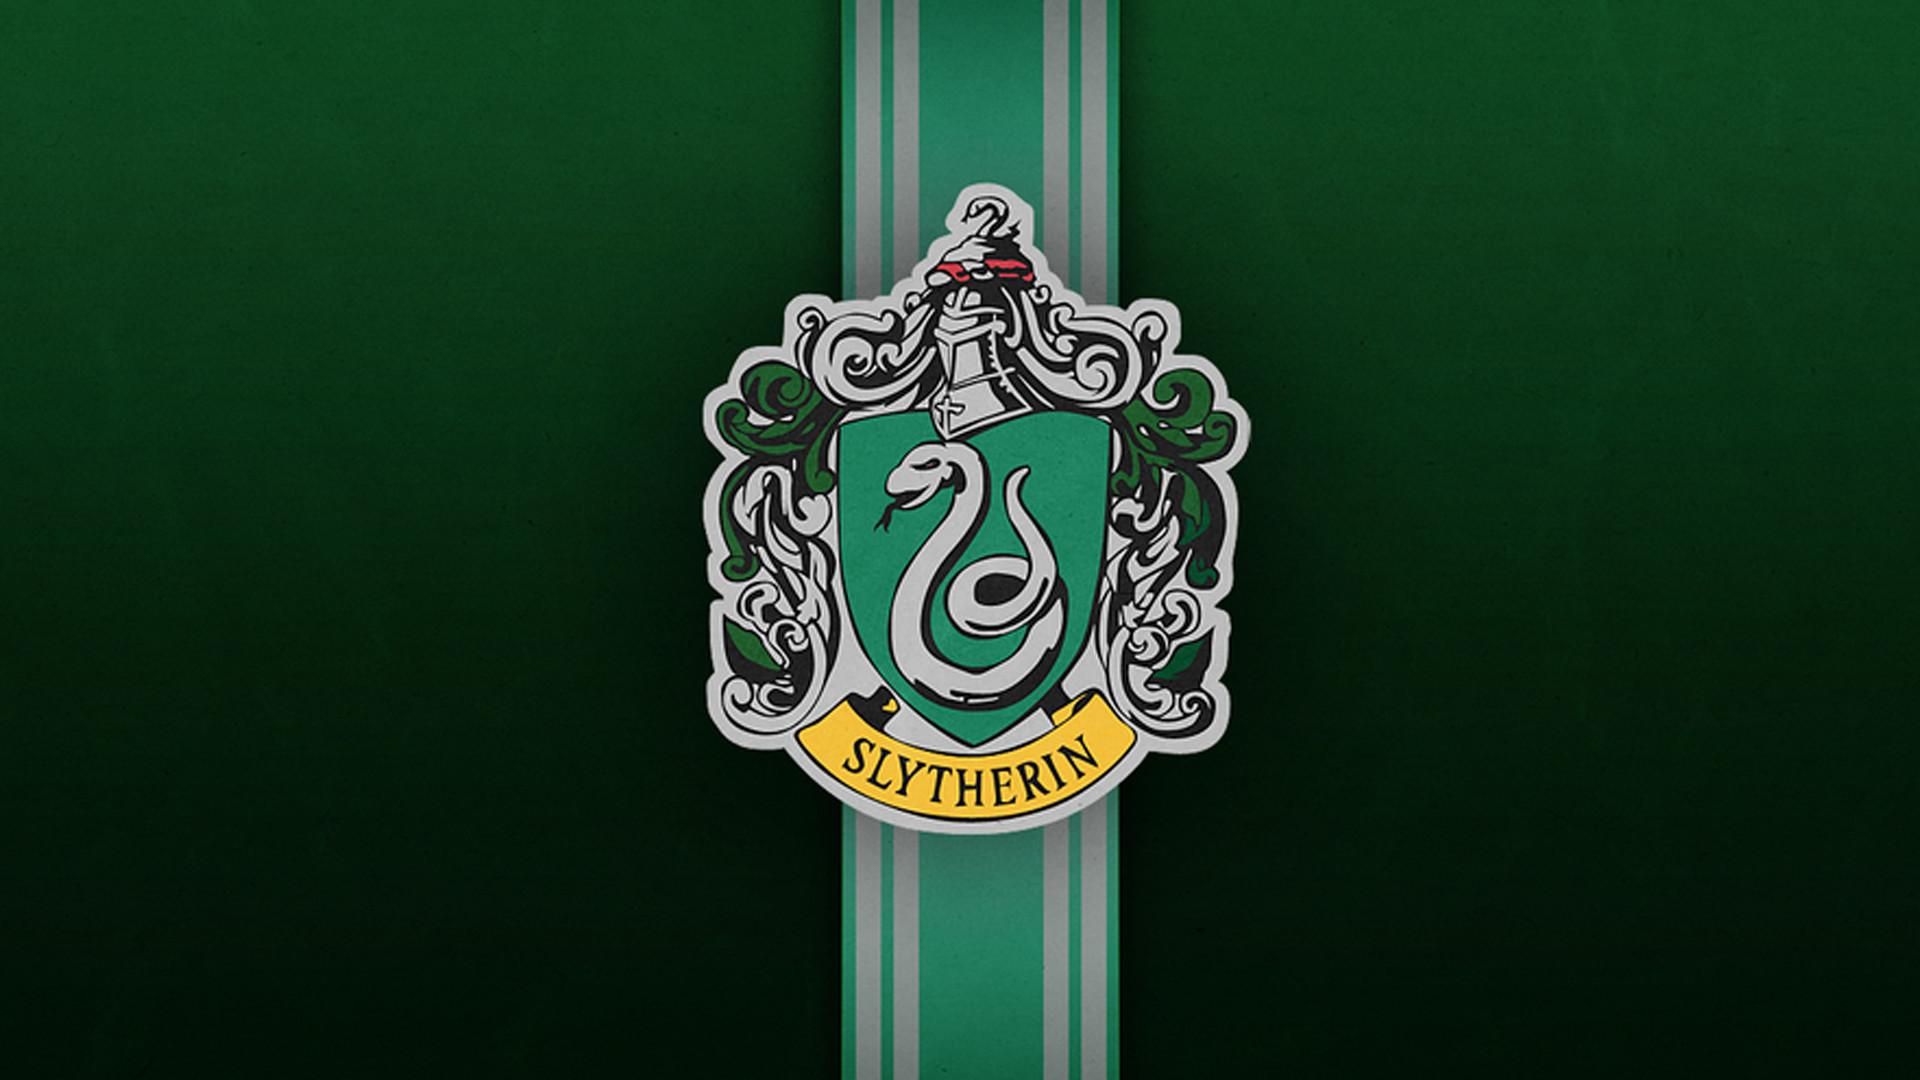 Quidditch Team Pride Wallpaper: Slytherin by TheLadyAvatar .